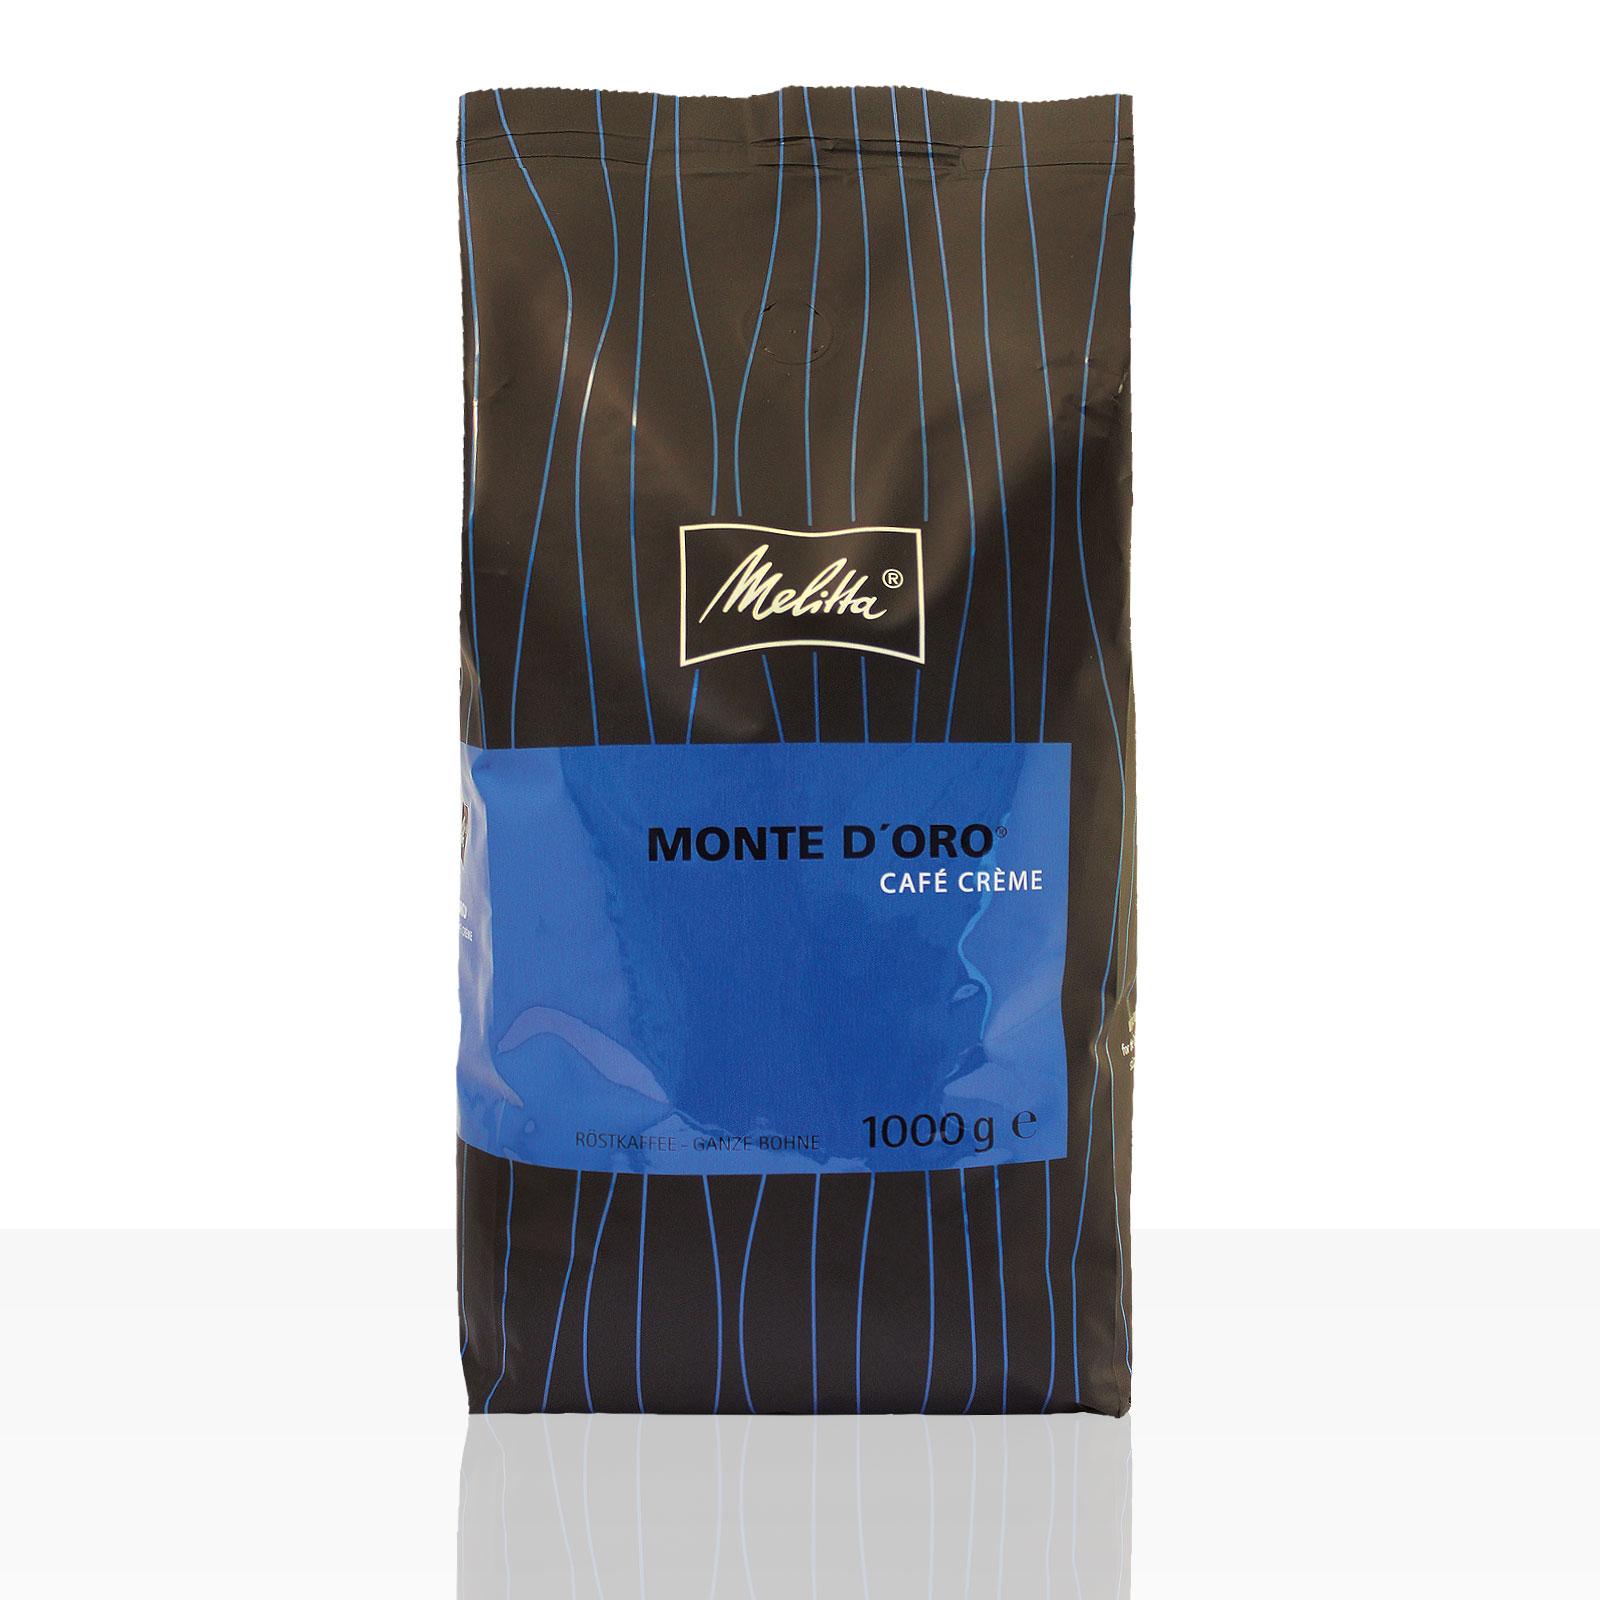 Melitta Monte D'Oro würzig Cafe Creme - 1kg ganze Kaffee-Bohne